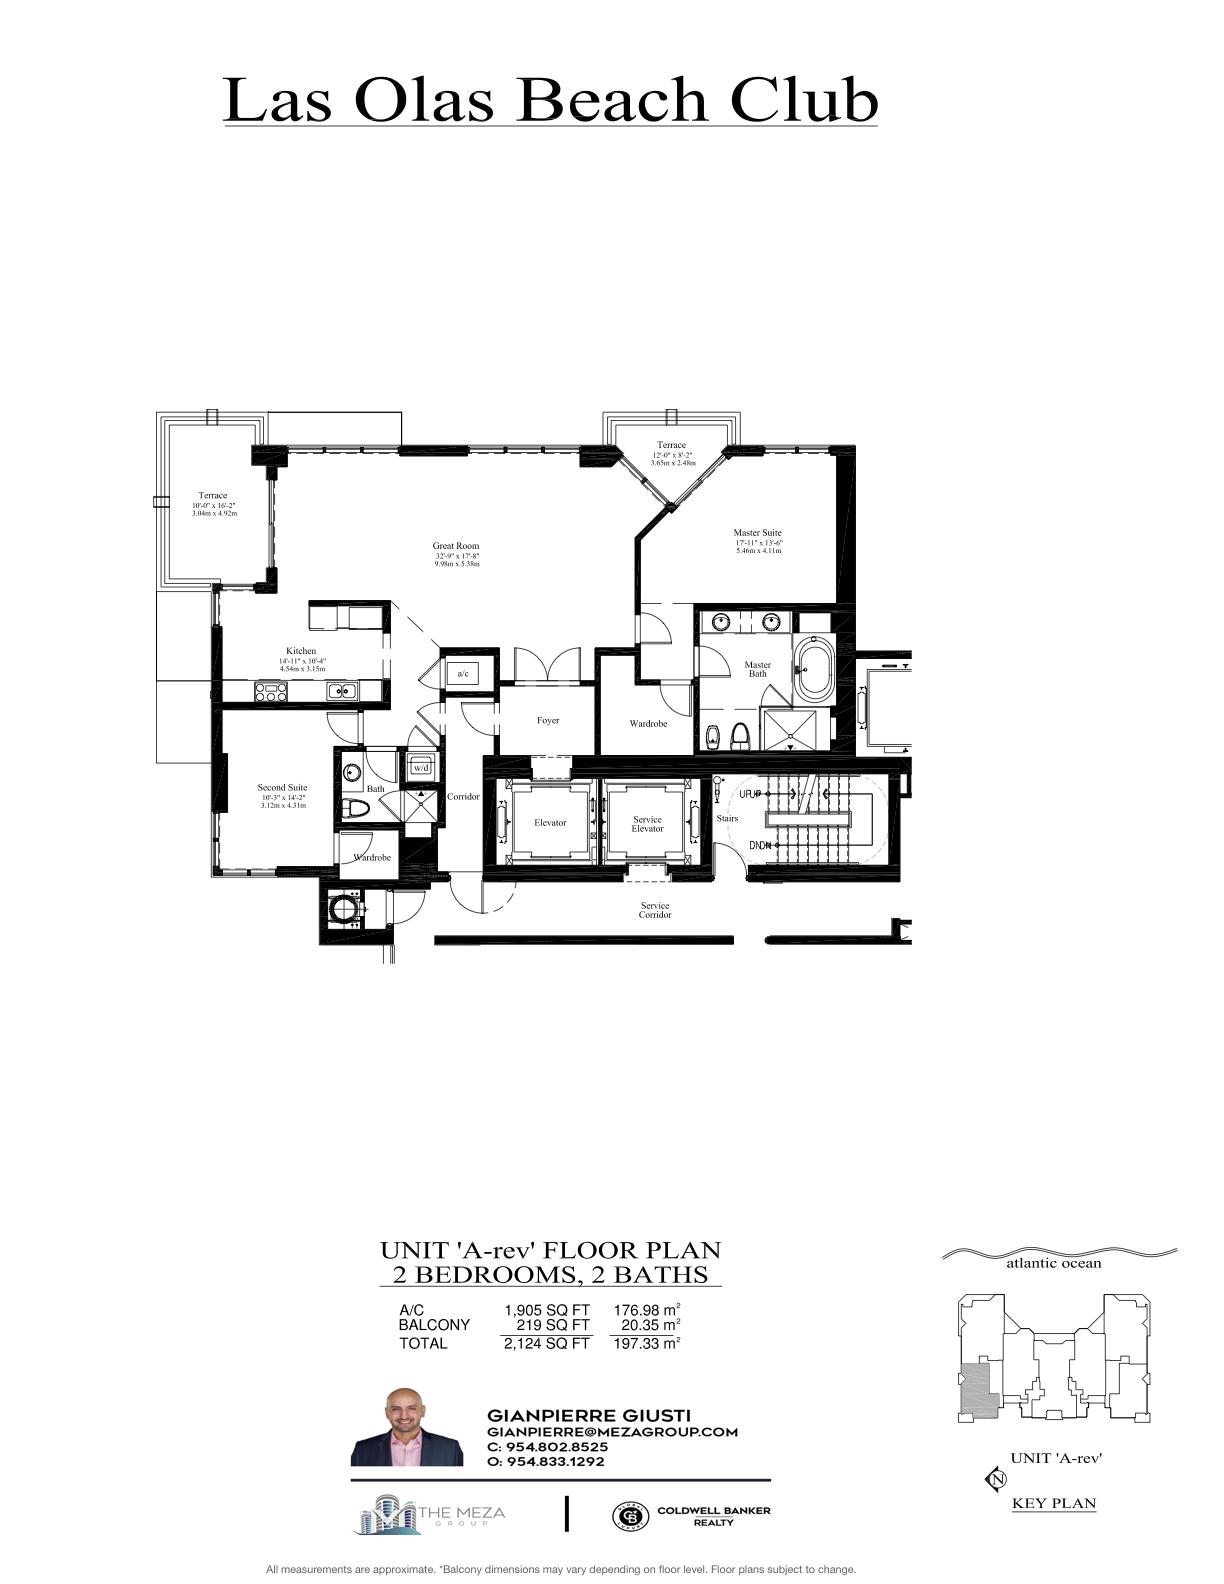 Las Olas Beach Club Model 'AR', '06' Line Floor Plan